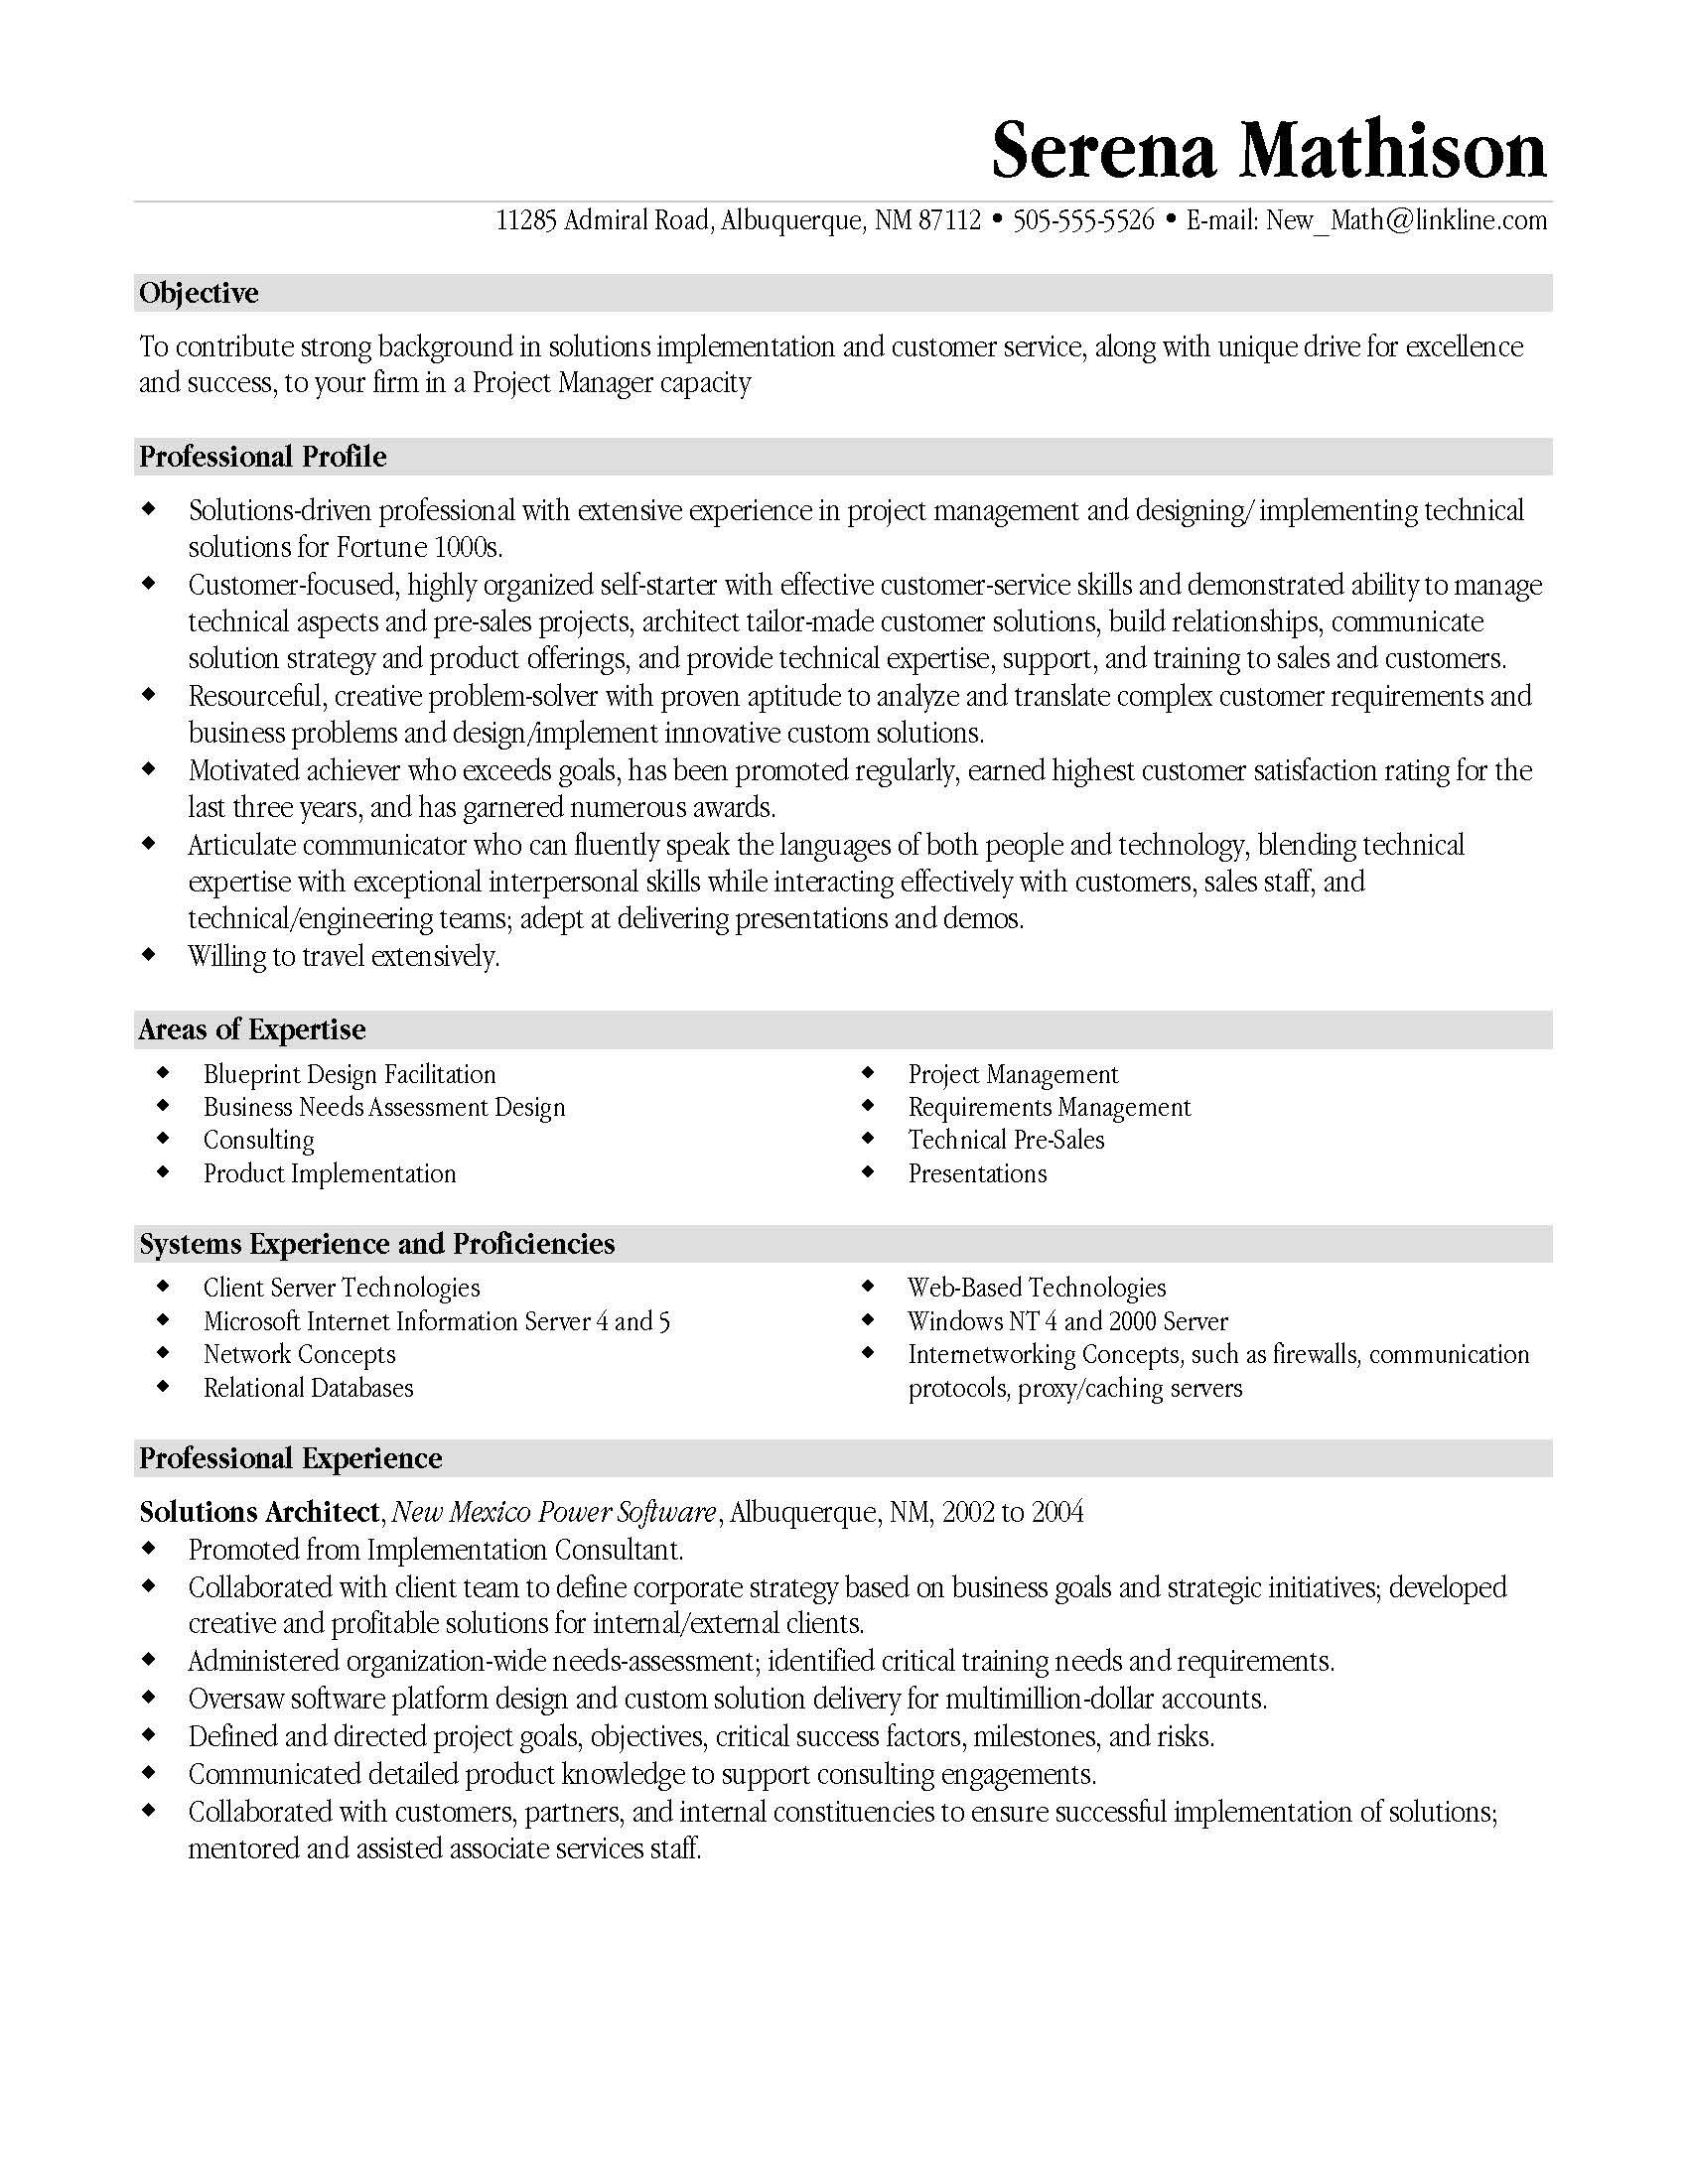 Information Technology Security Manager Job Description